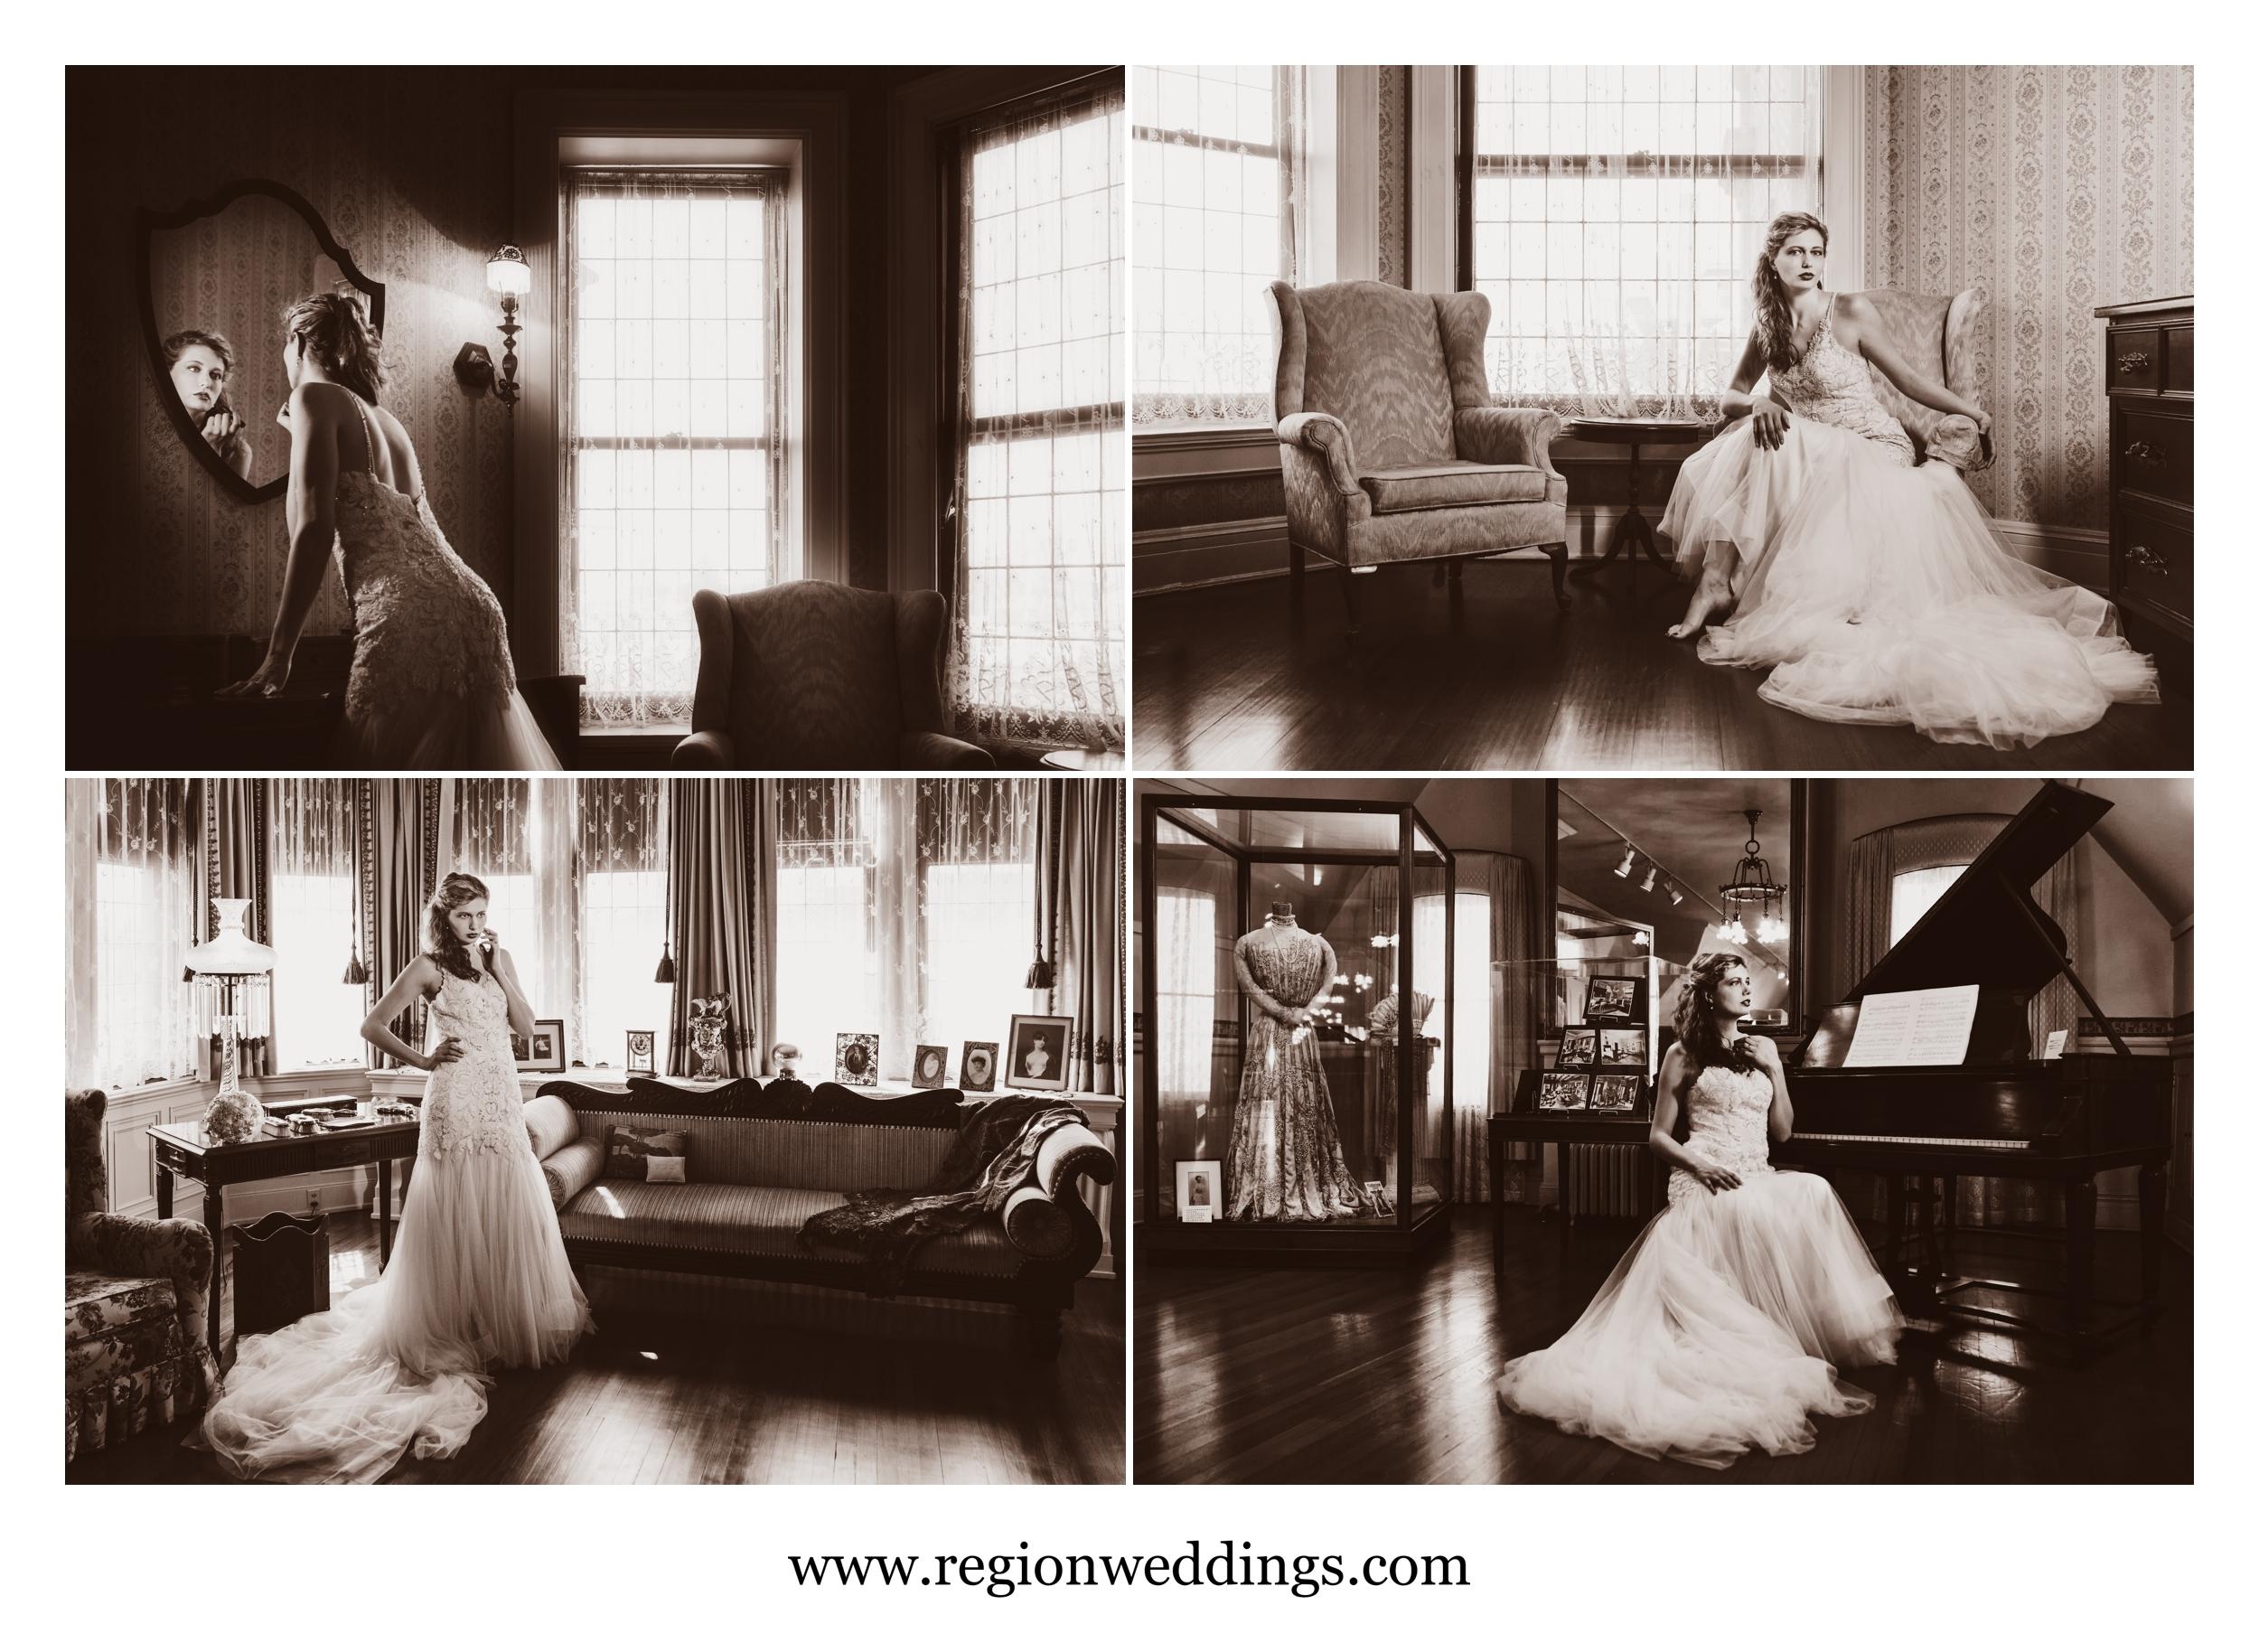 Vintage styled wedding photos at Barker Mansion.